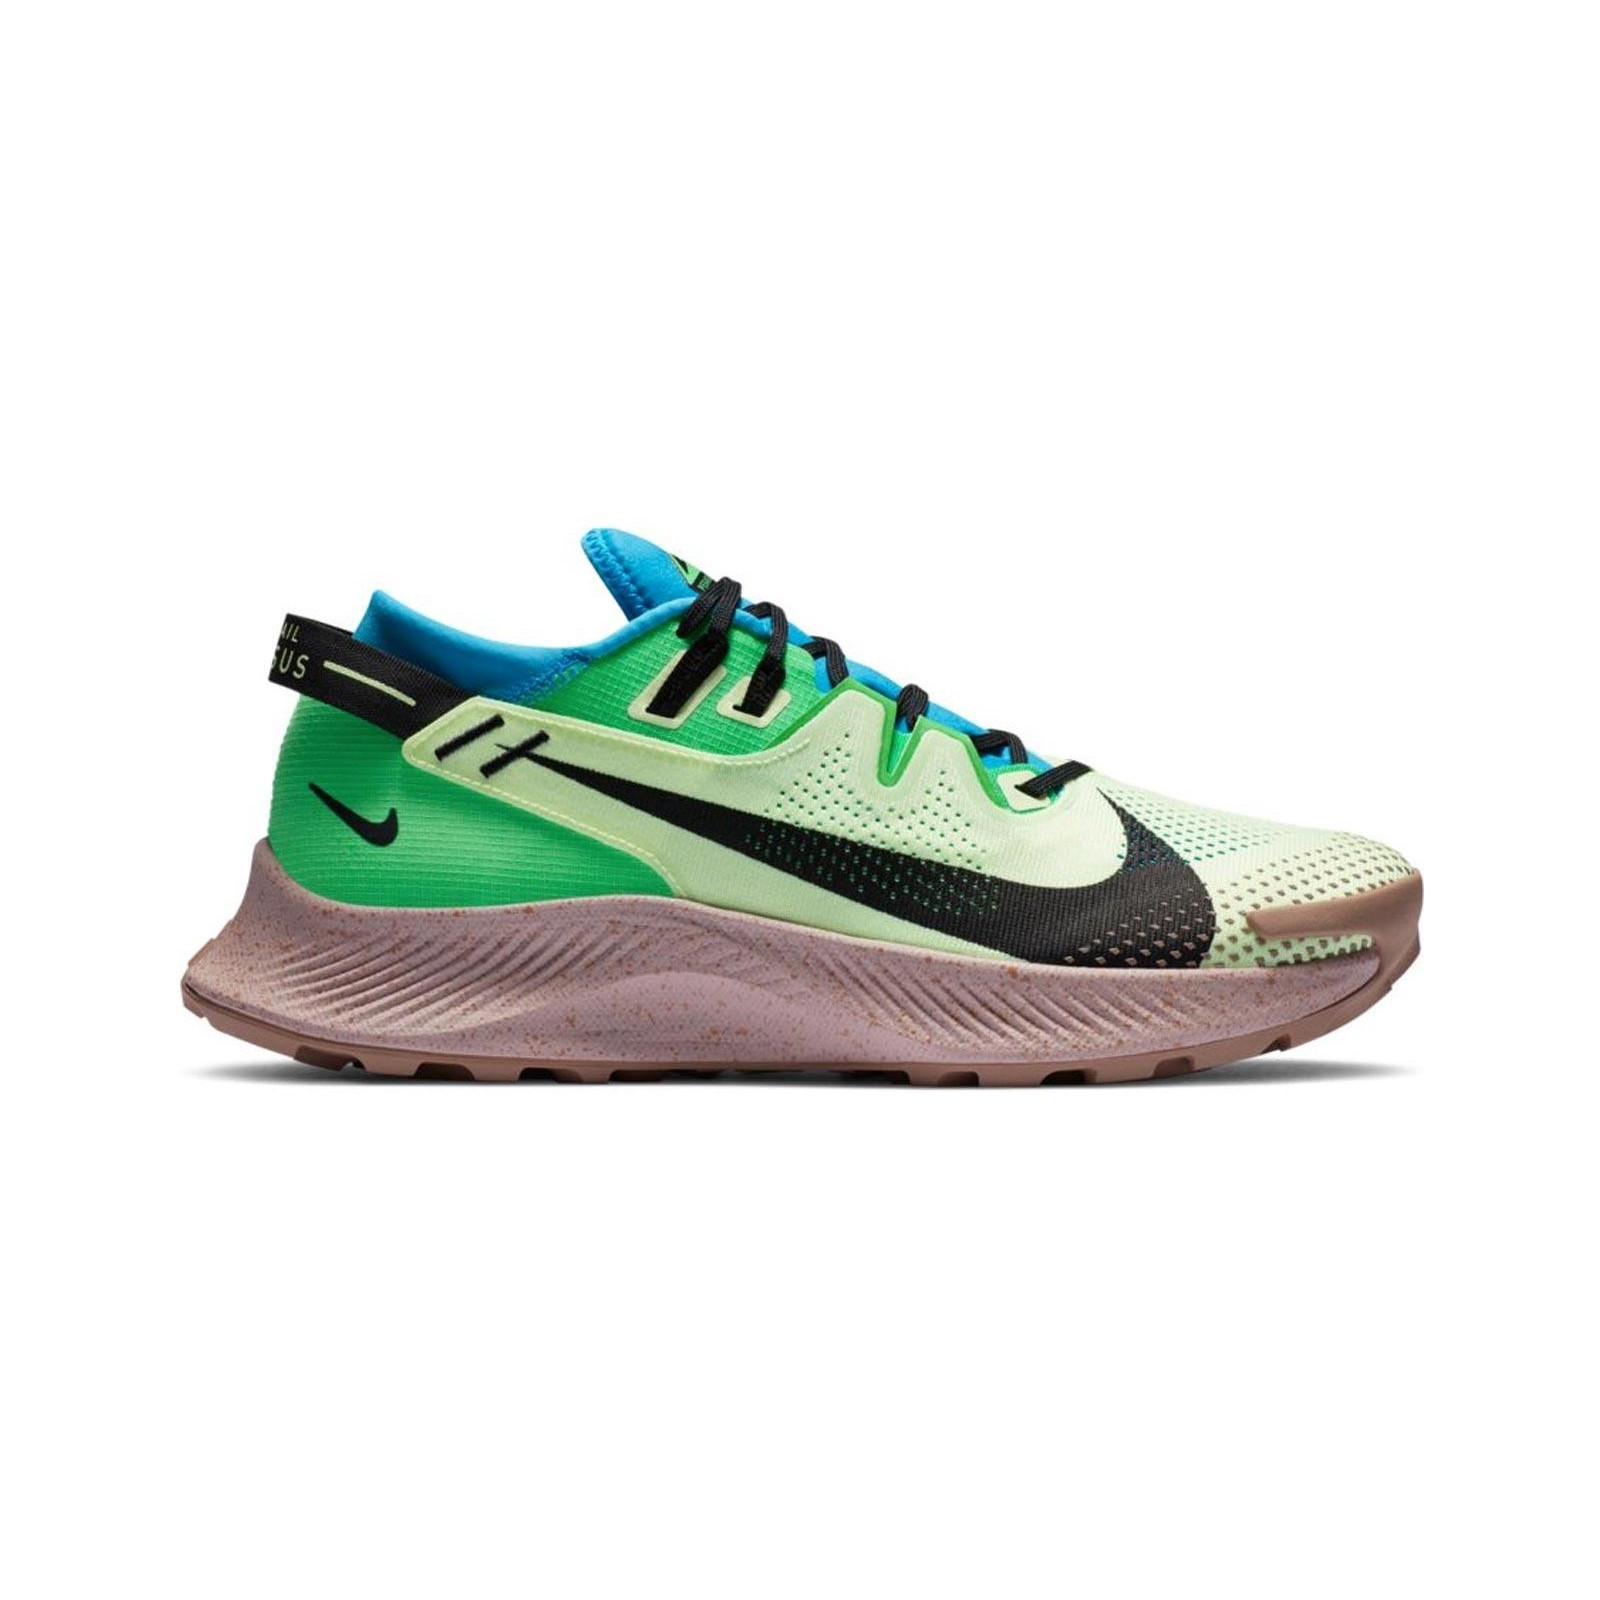 oferta zapatillas trail running nike